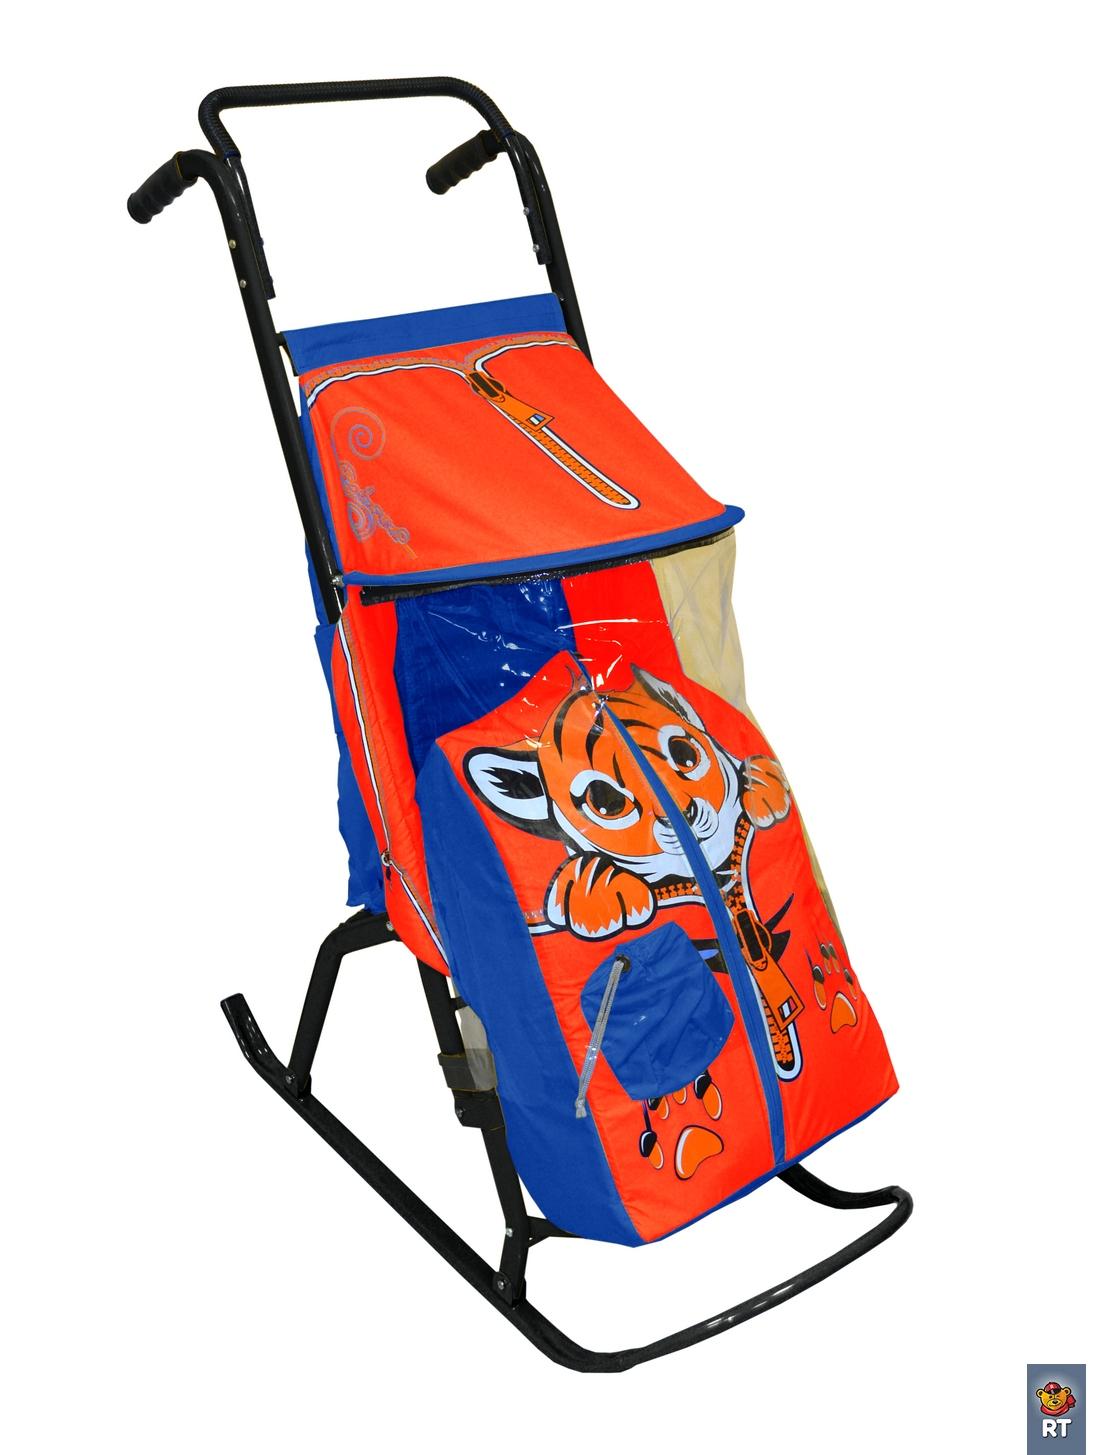 Санки-коляска - Снегурочка-2-Р – Тигренок, цвет синий-красныйСанки и сани-коляски<br>Санки-коляска - Снегурочка-2-Р – Тигренок, цвет синий-красный<br>